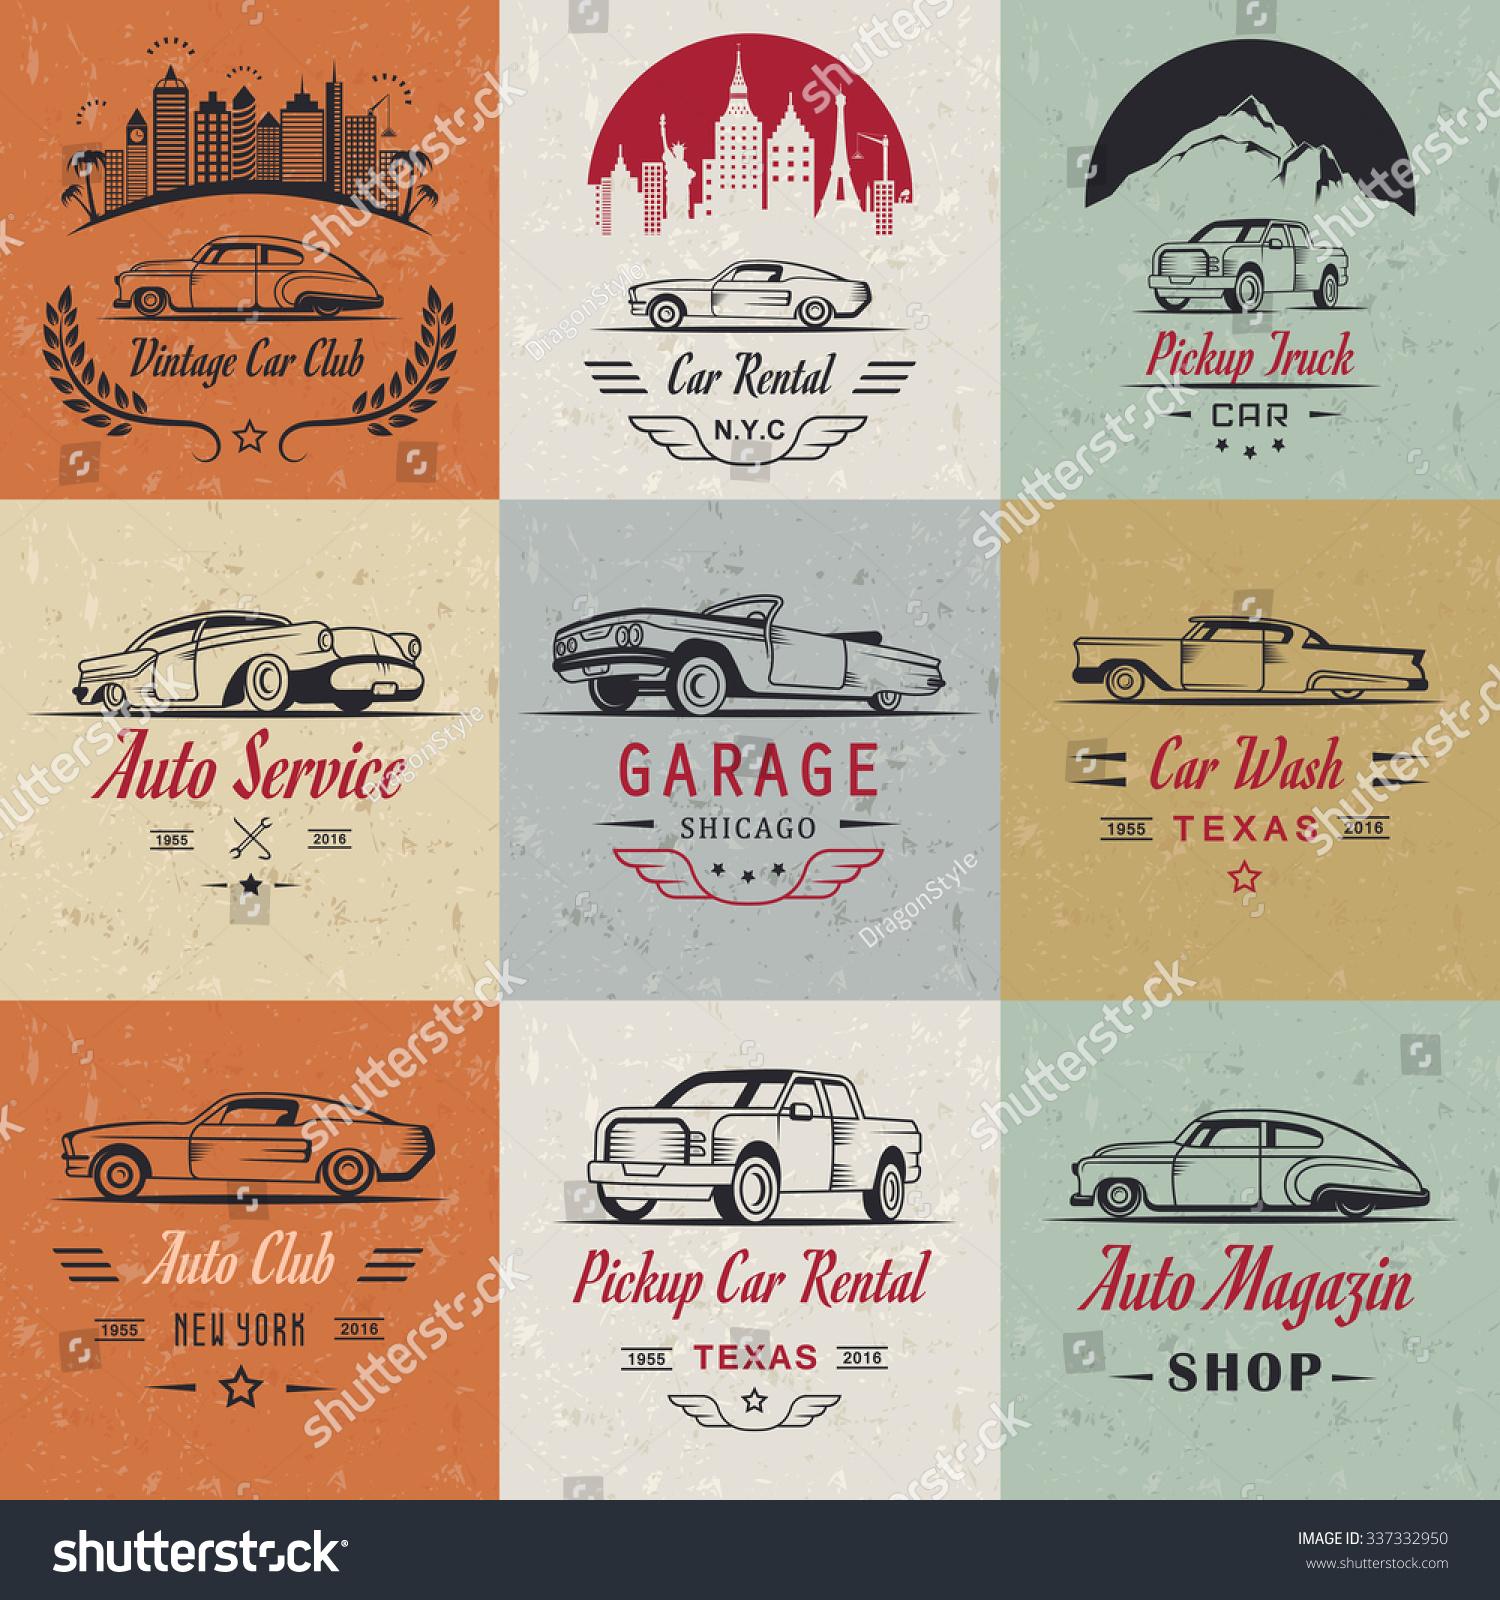 Vector Set Of Vintage Car Symbols And Sign. Car Service